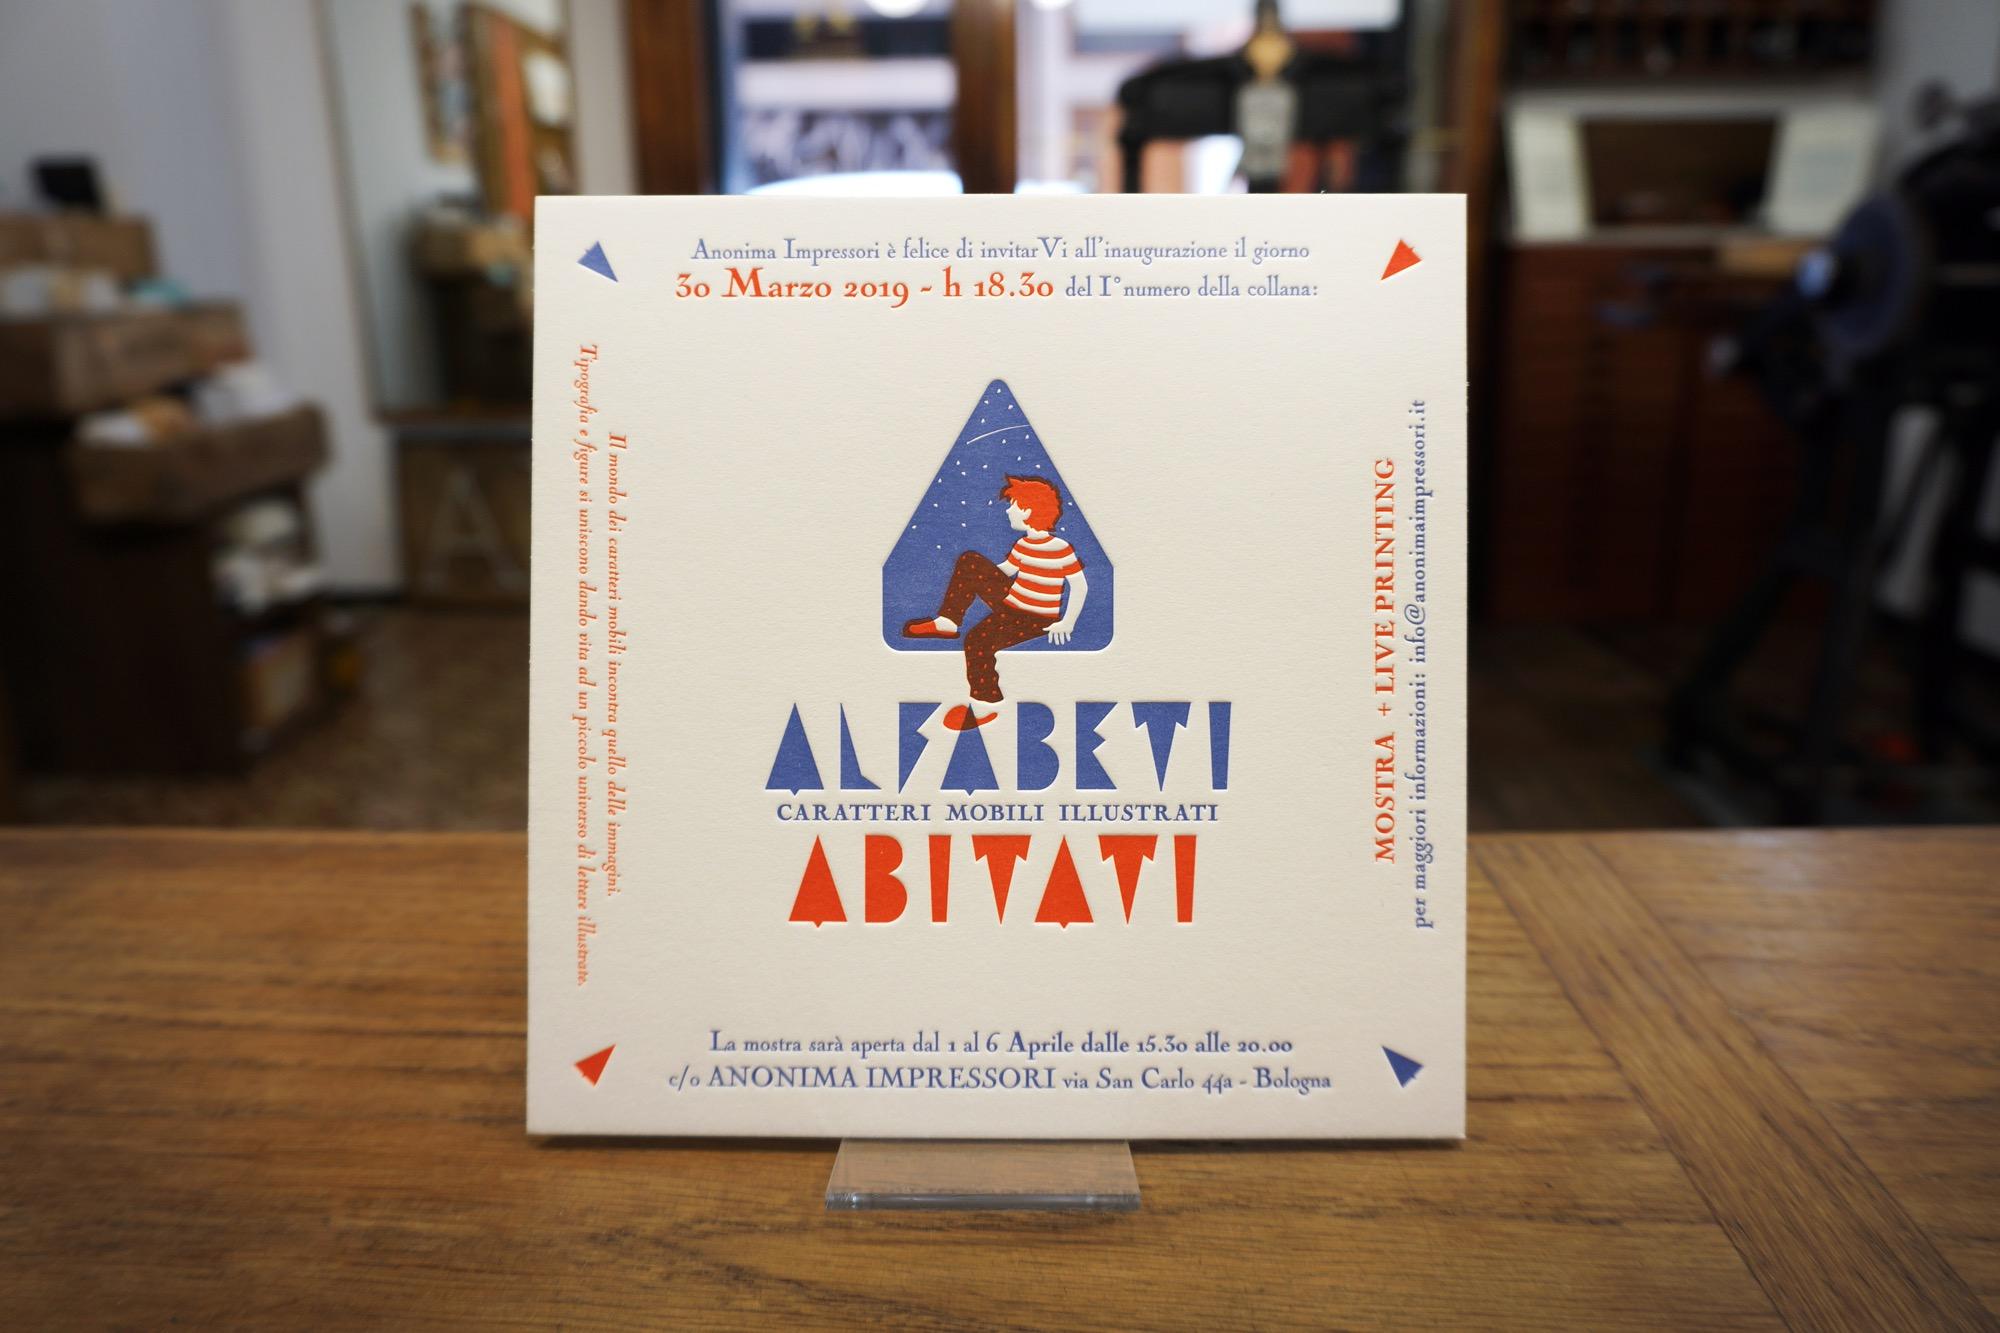 AlfabetiAbitati Invito Cartaceo